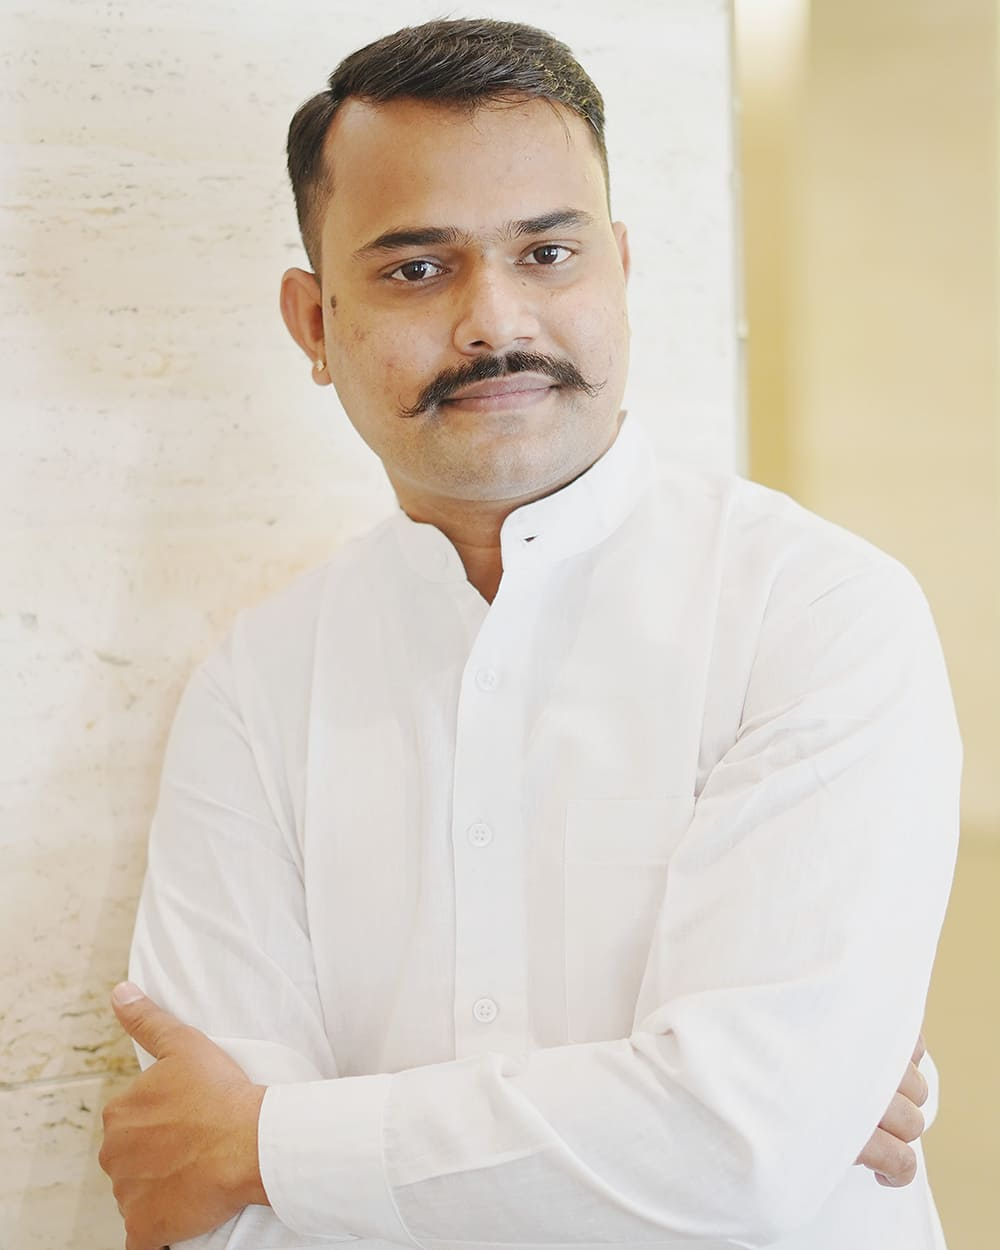 Chandravijaysinh Chauhan